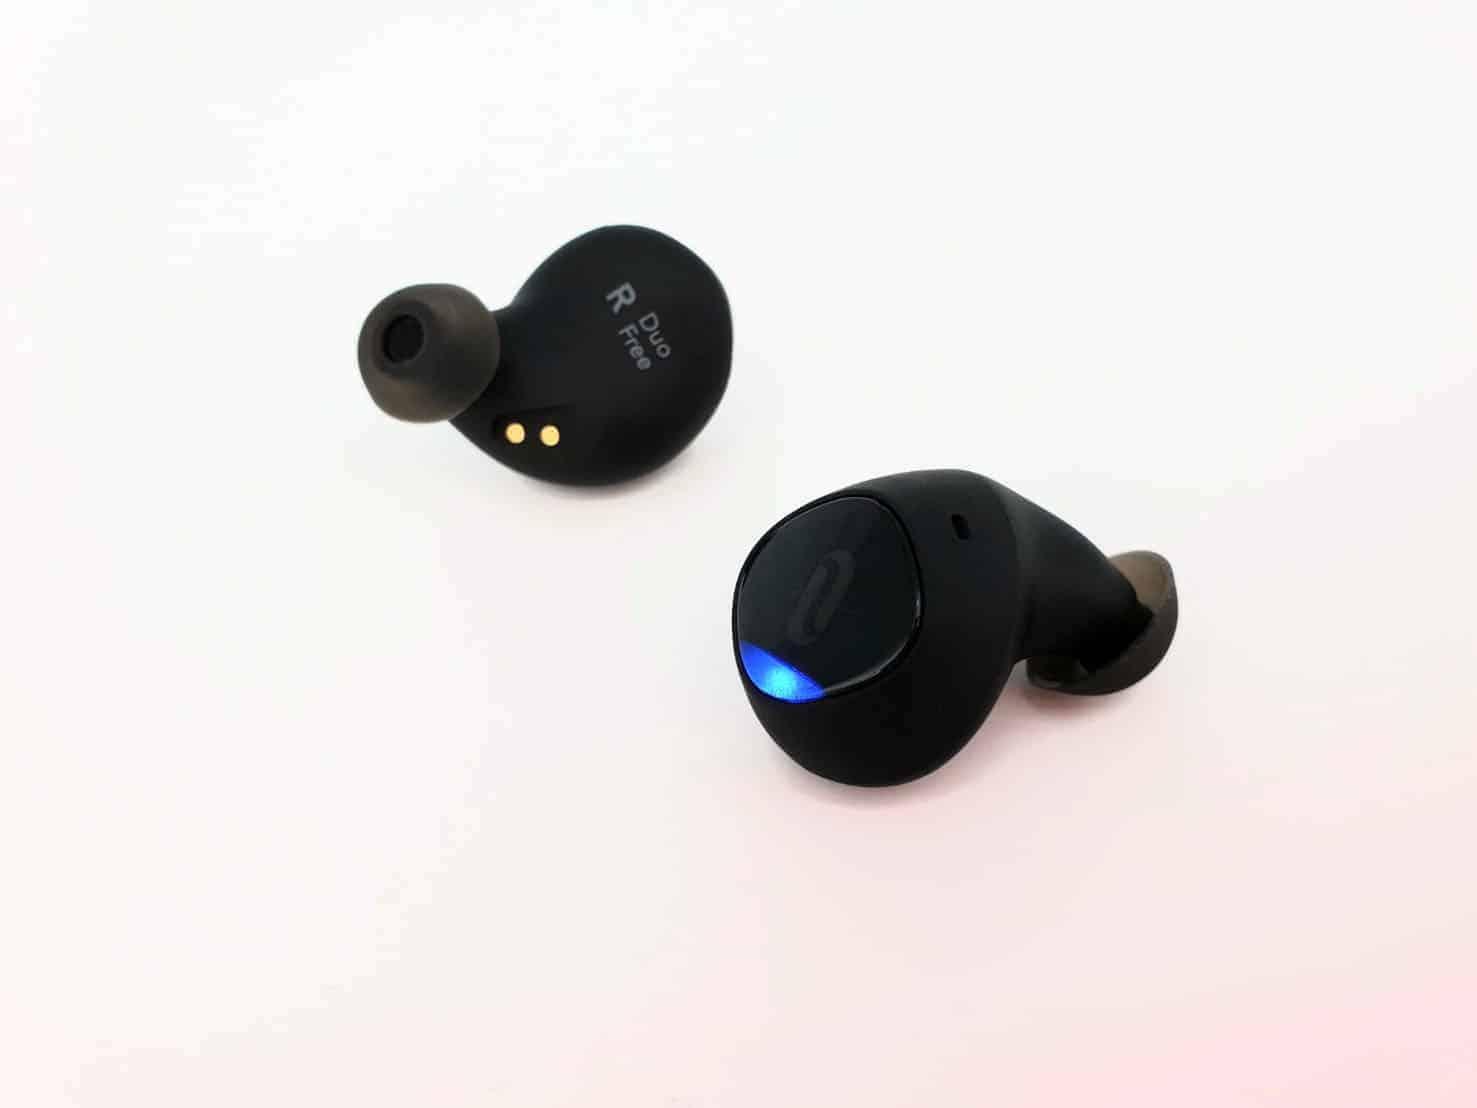 TaoTroncis Duo Free平價真無線耳機推薦 耳機外型